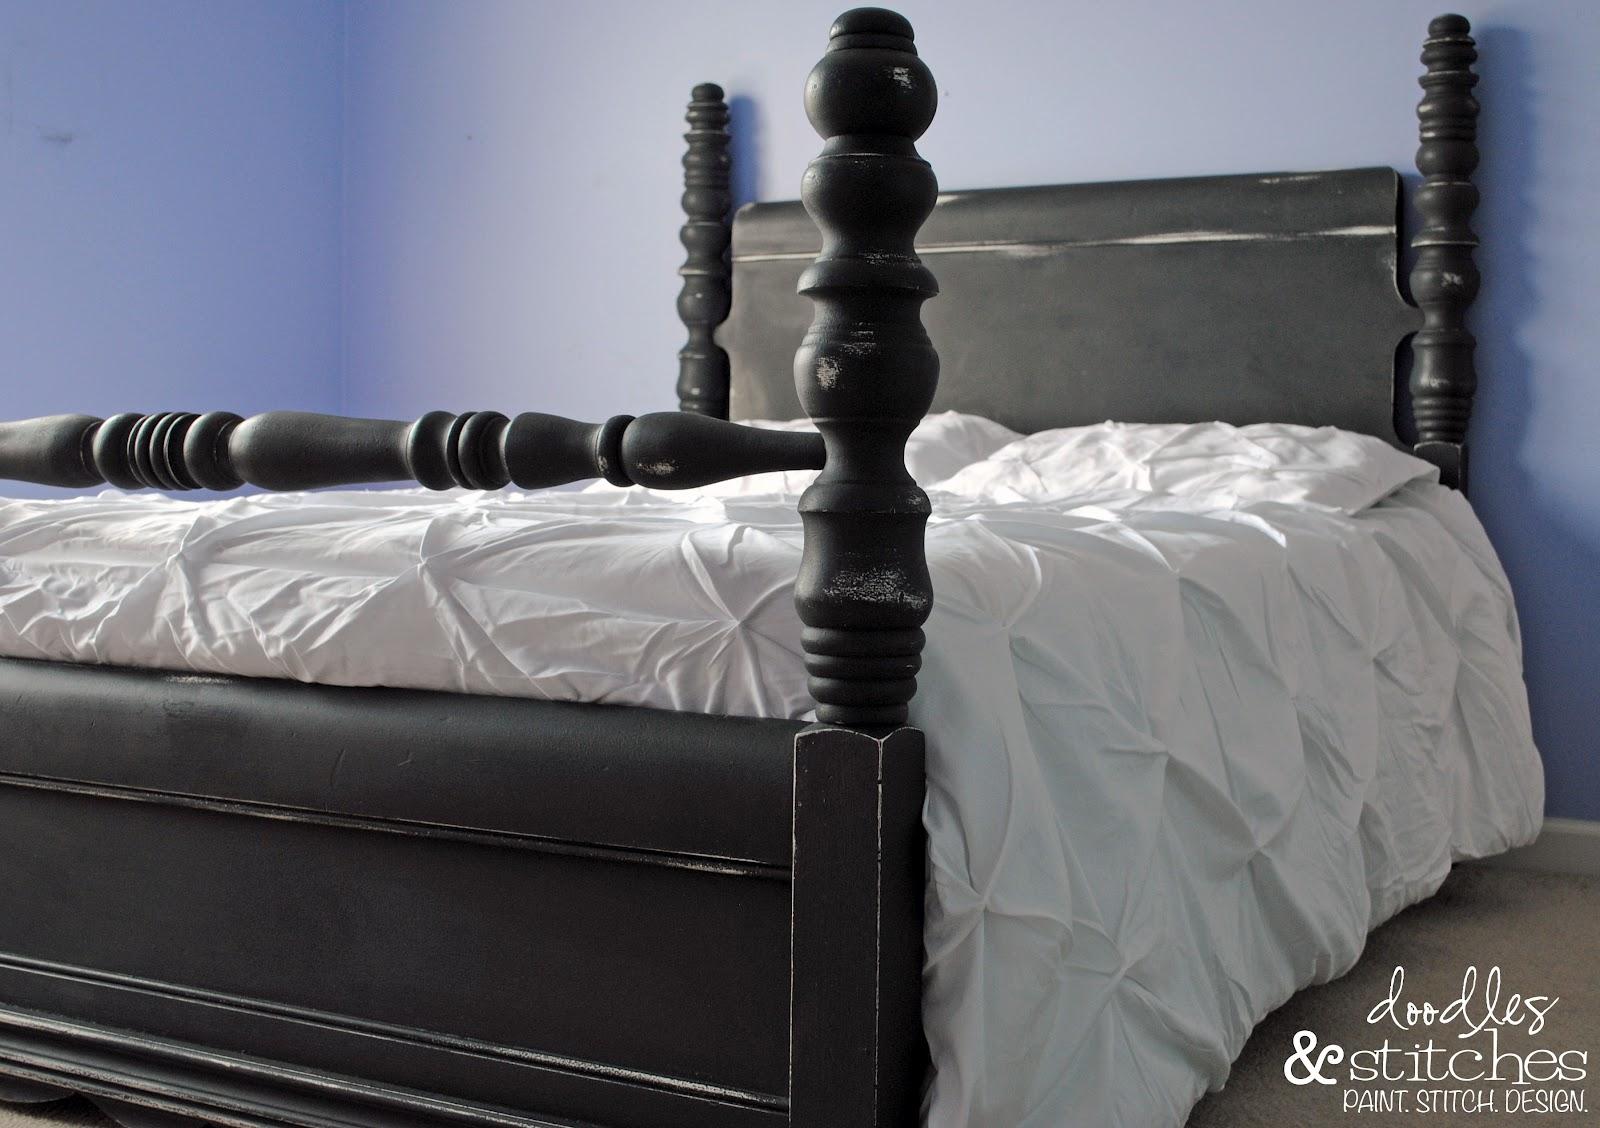 Sofa Support Bed Bath And Beyond Best Sleeper Reviews Big Lots Futon Mattress Sale